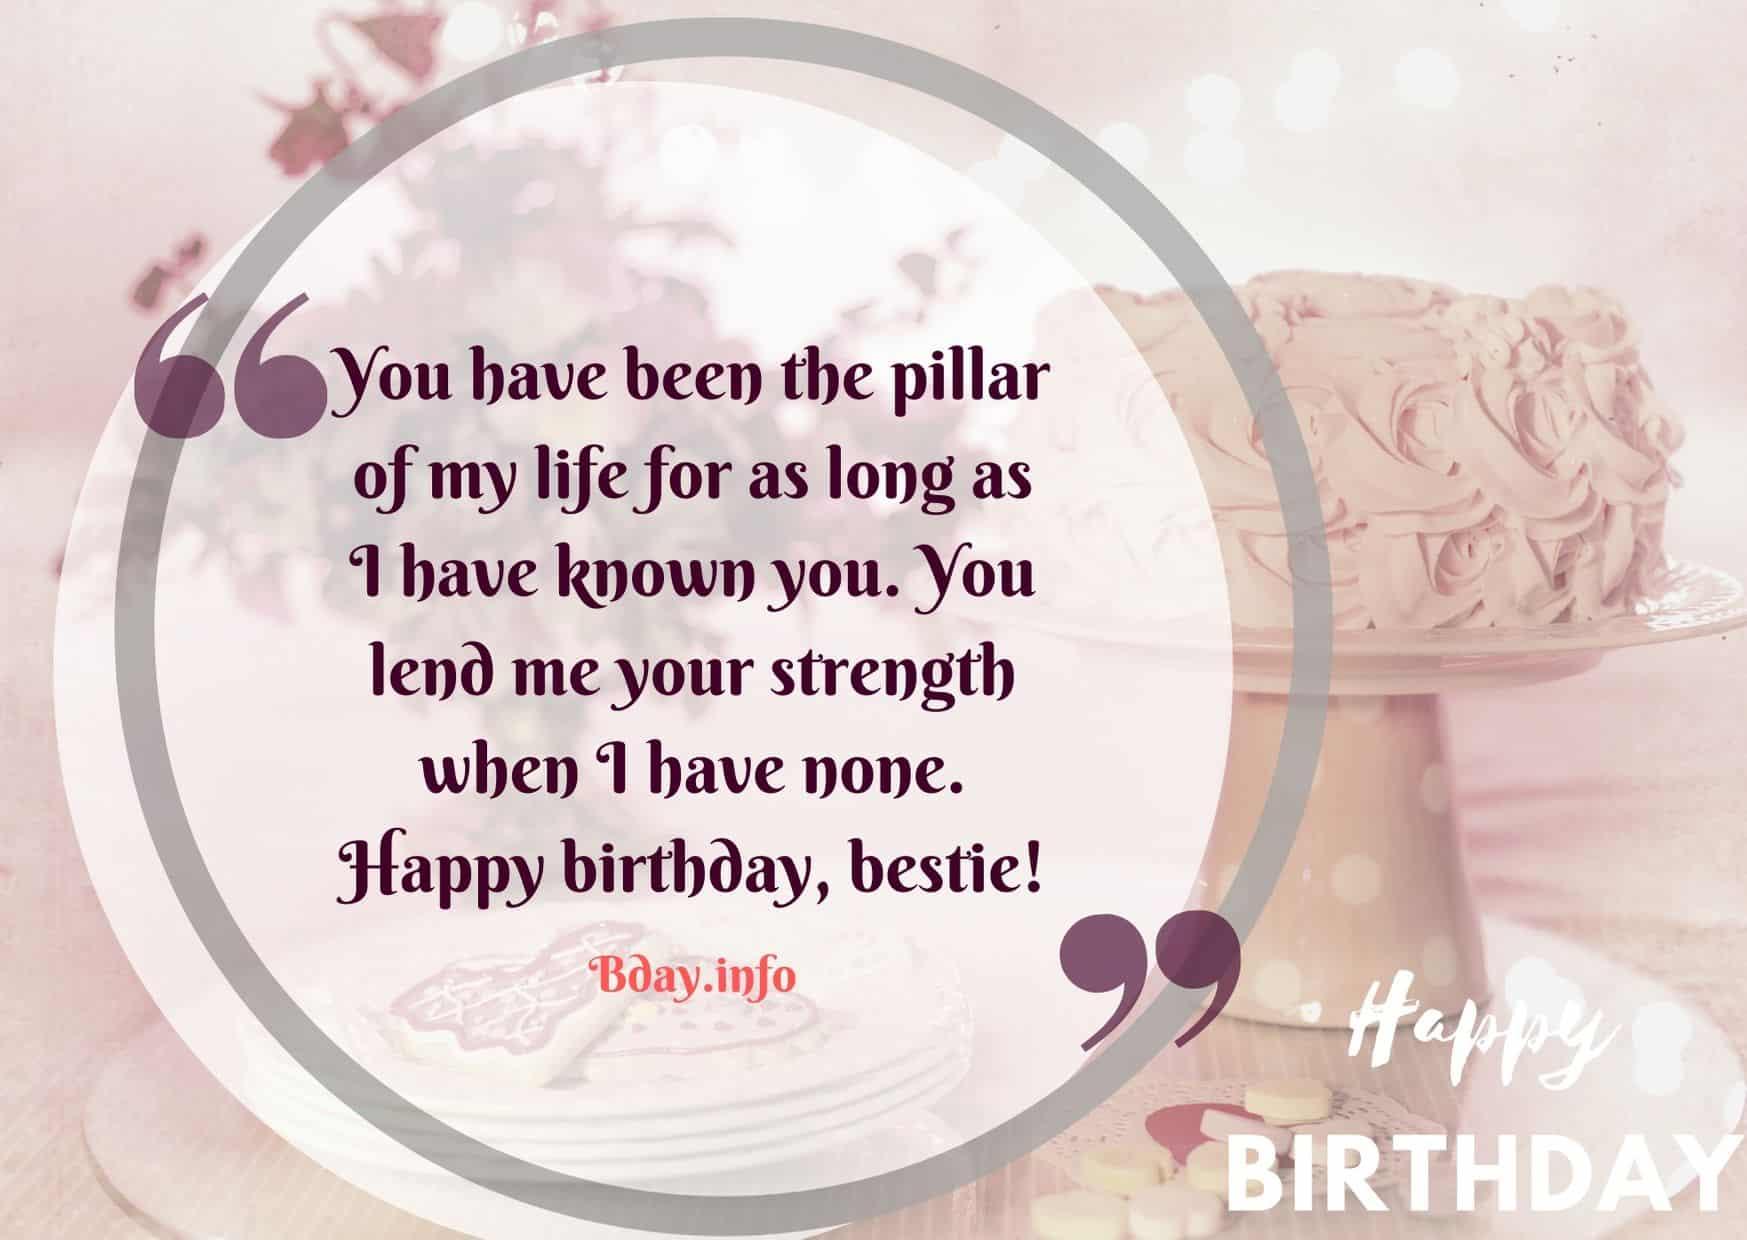 Birthday Wishes for Best Friend - Bday.info